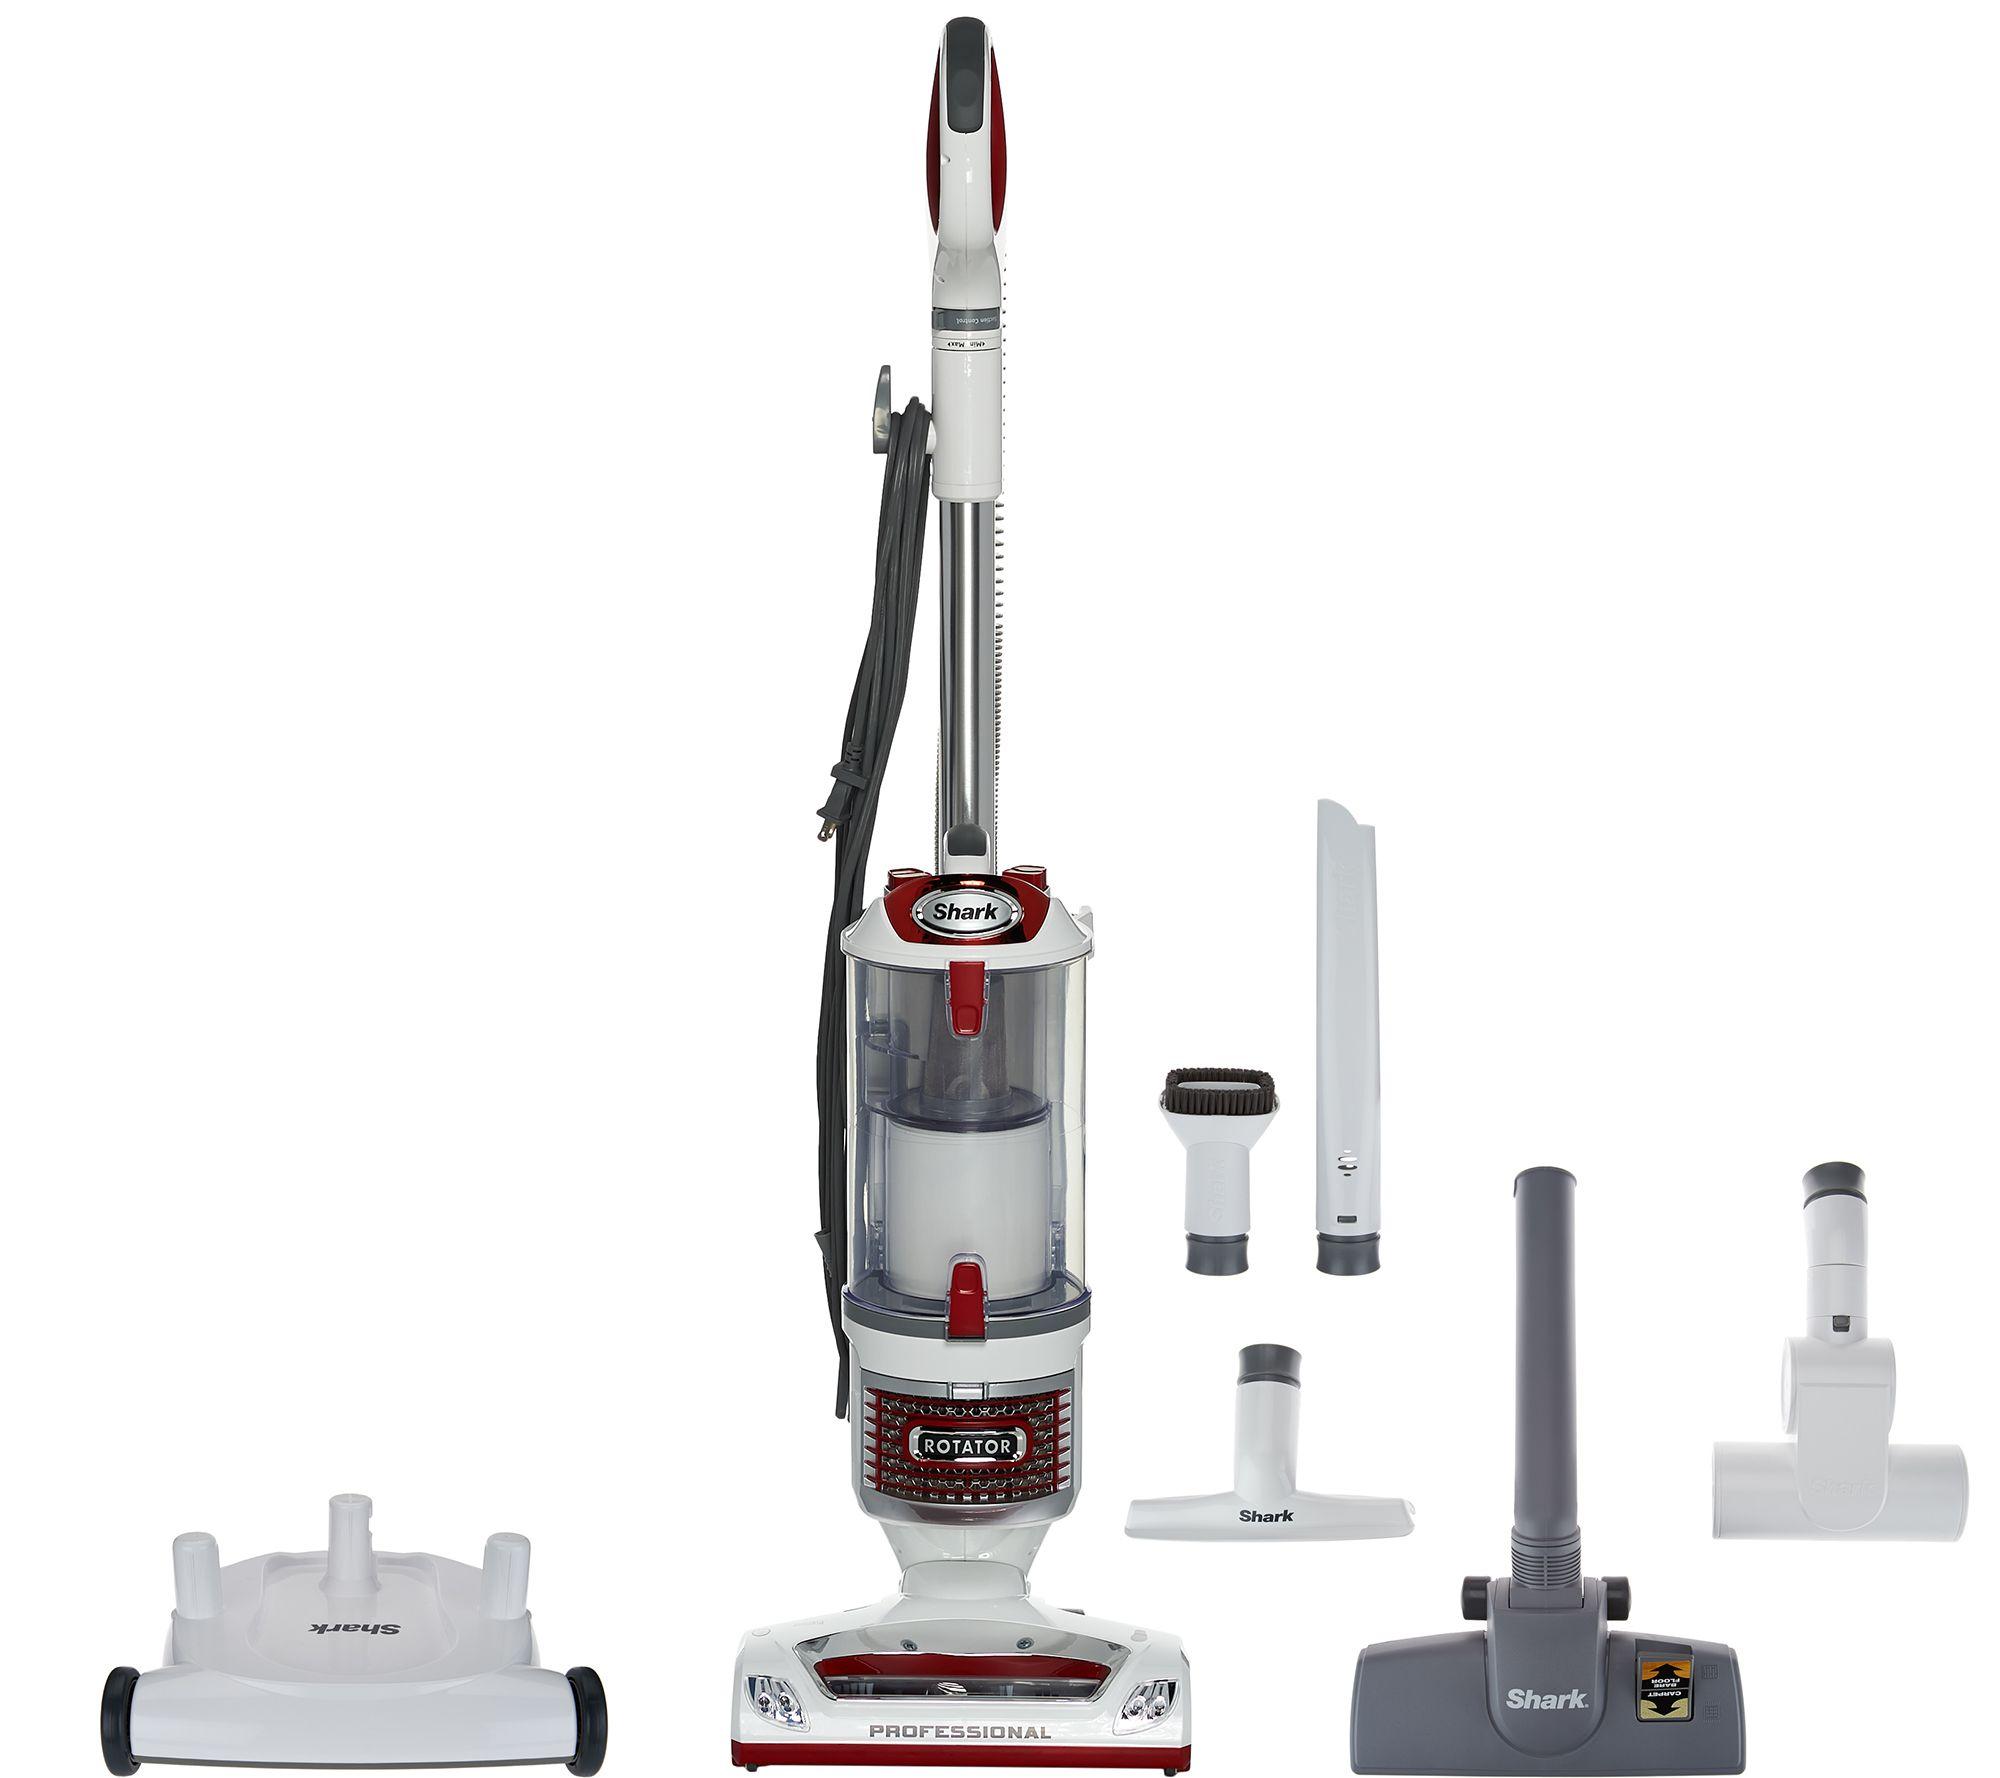 Shark Vacuum Models >> Shark Rotator Professional 3-In-1 Liftaway Upright Vacuum w/Caddy & Tools - Page 1 — QVC.com